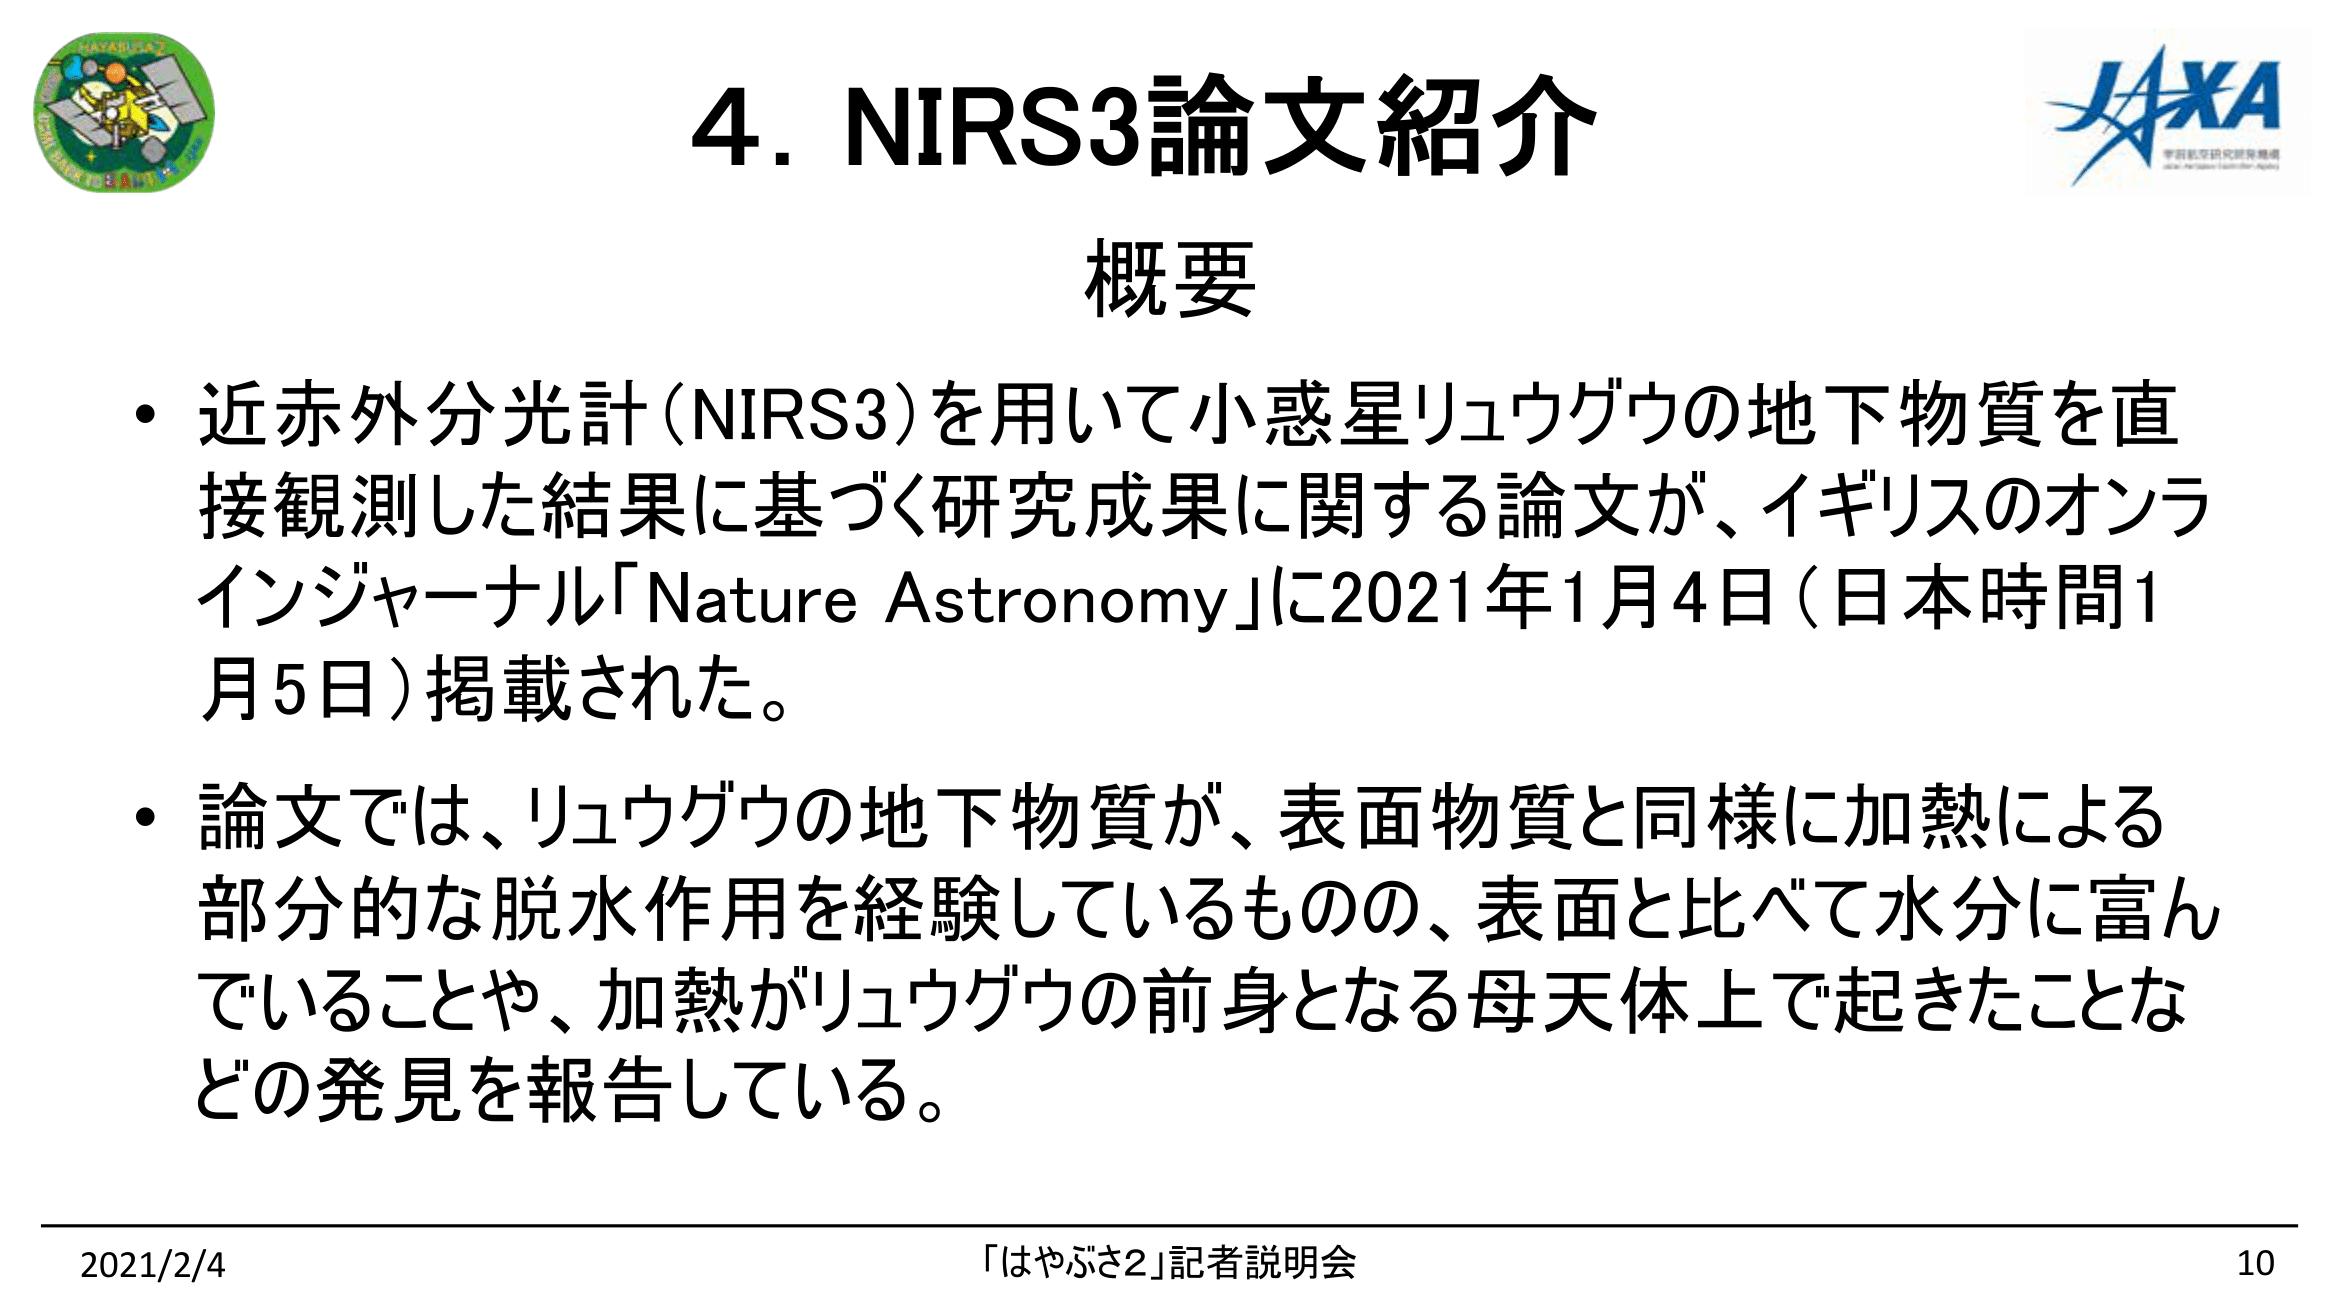 f:id:Imamura:20210204134253p:plain